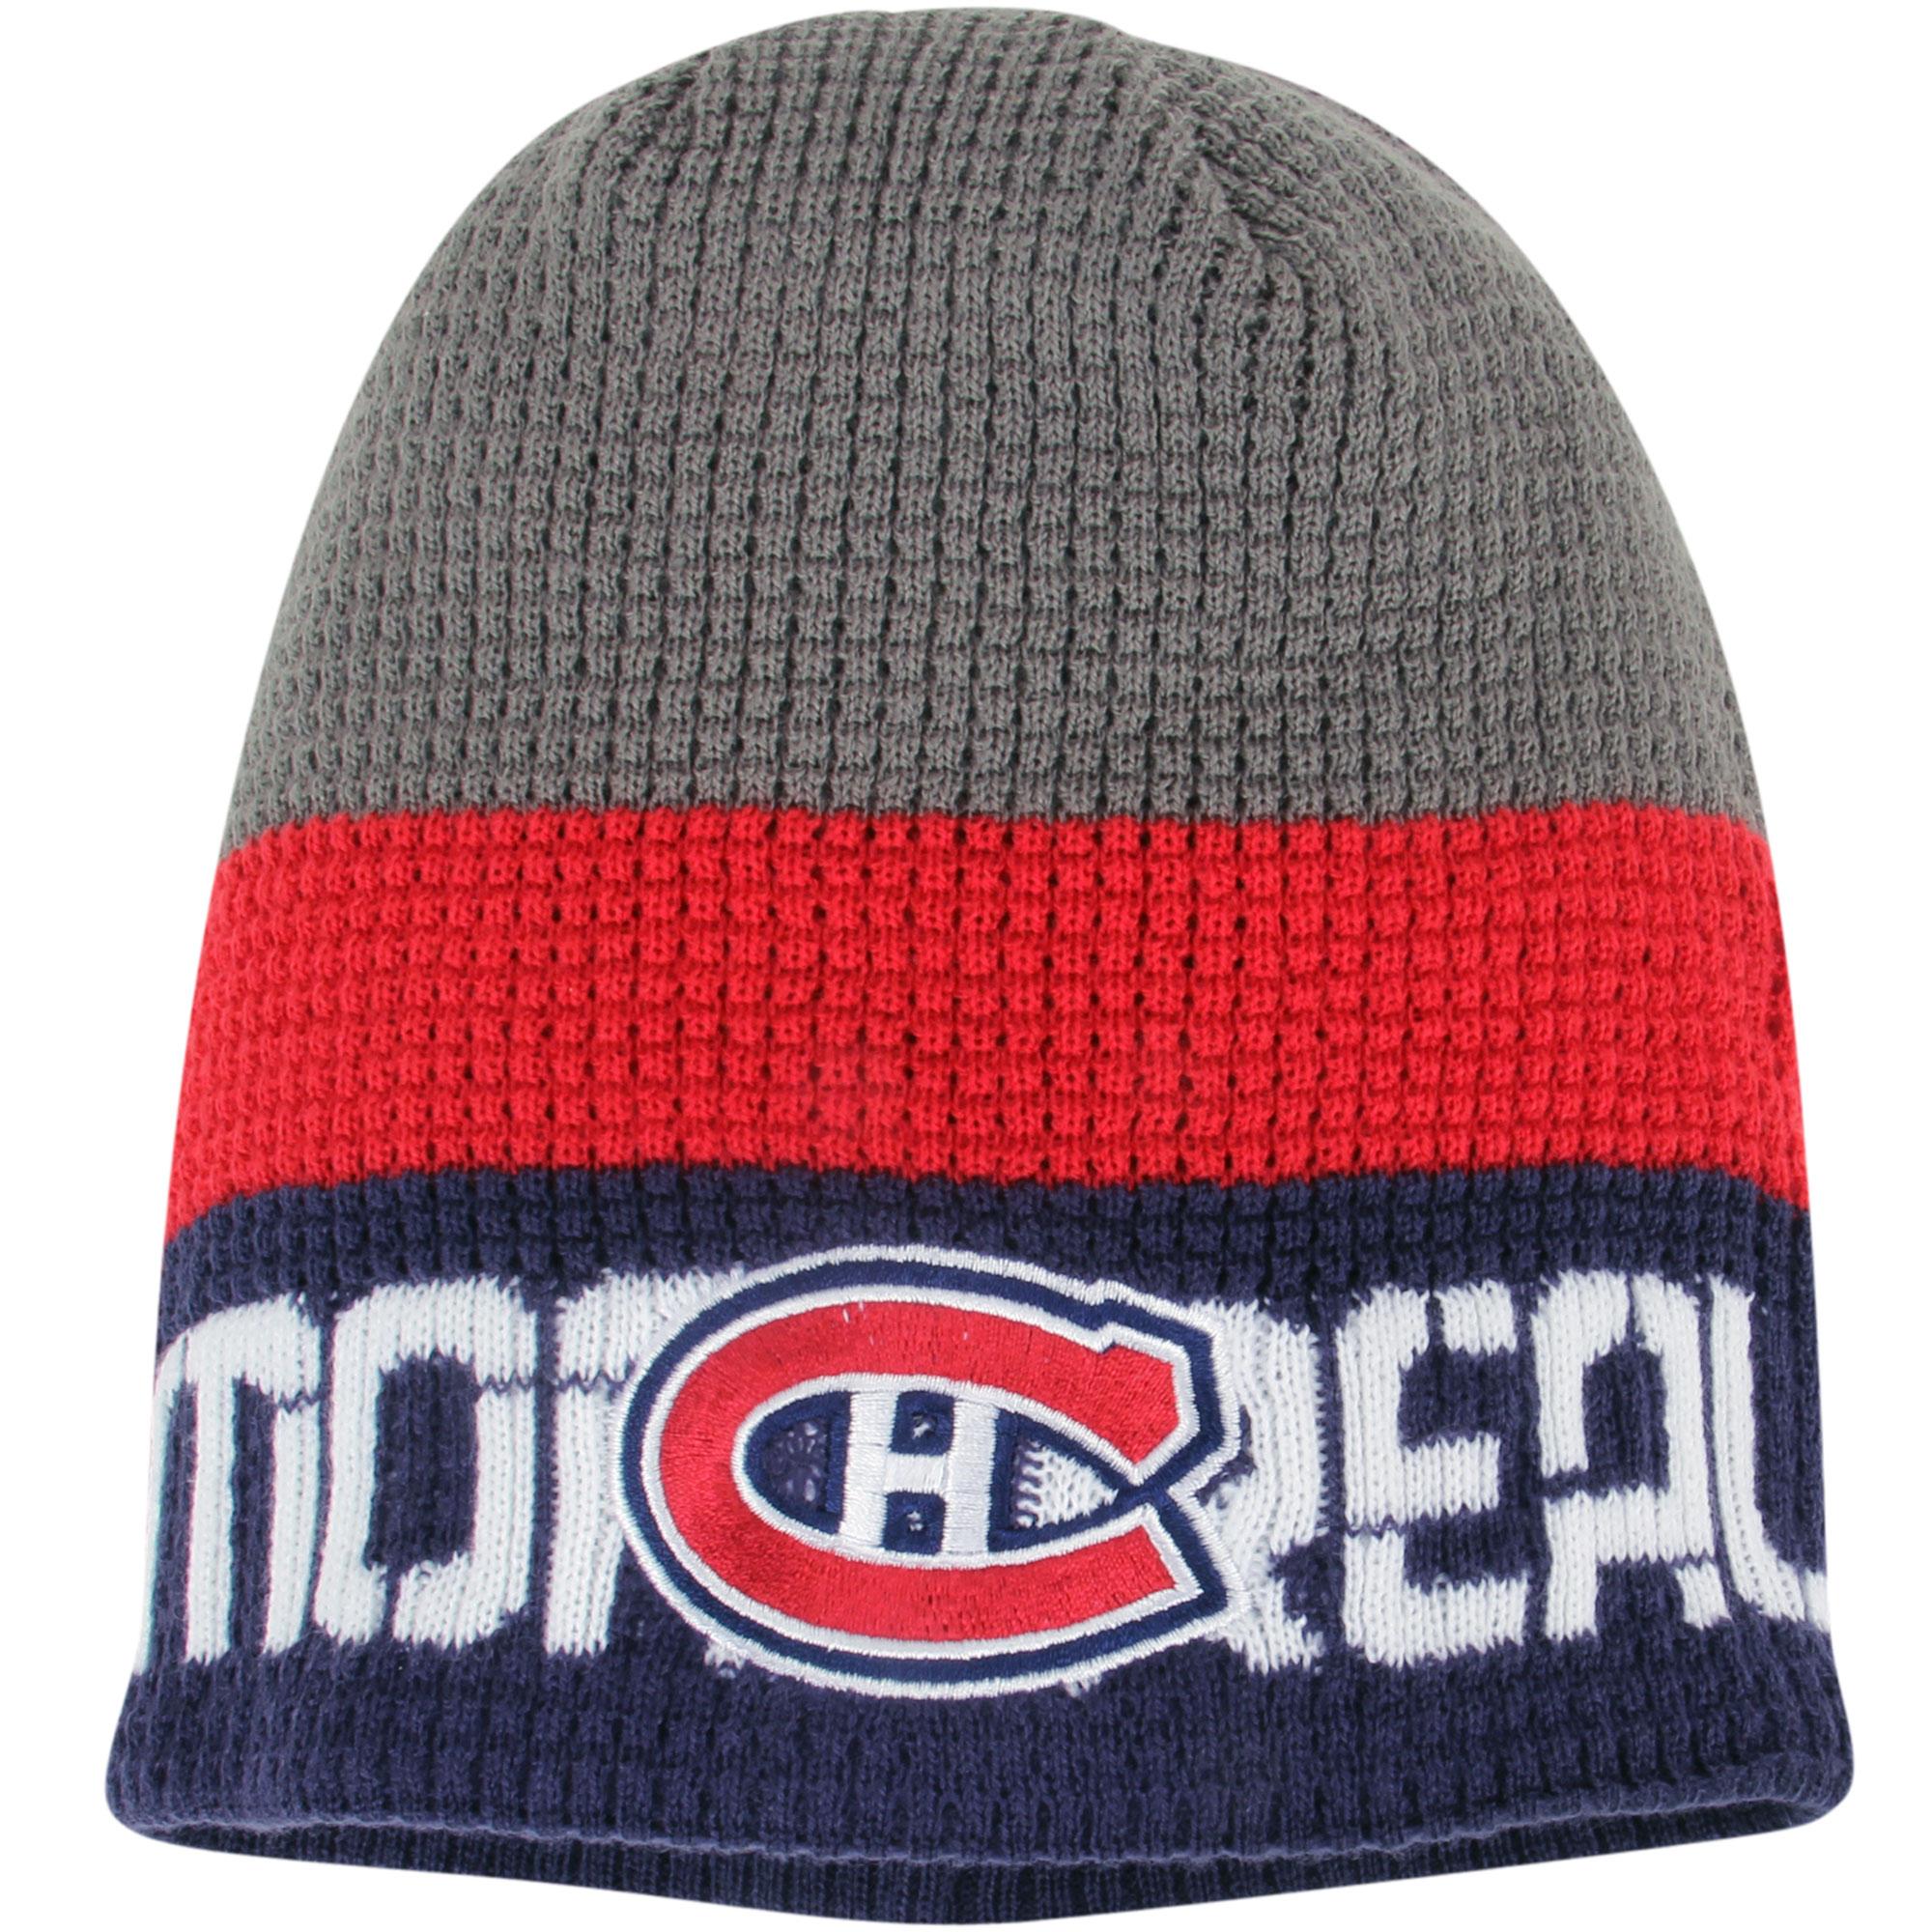 Montreal Canadiens Reebok Center Ice Uncuffed Knit Beanie - Gray/Navy - OSFA